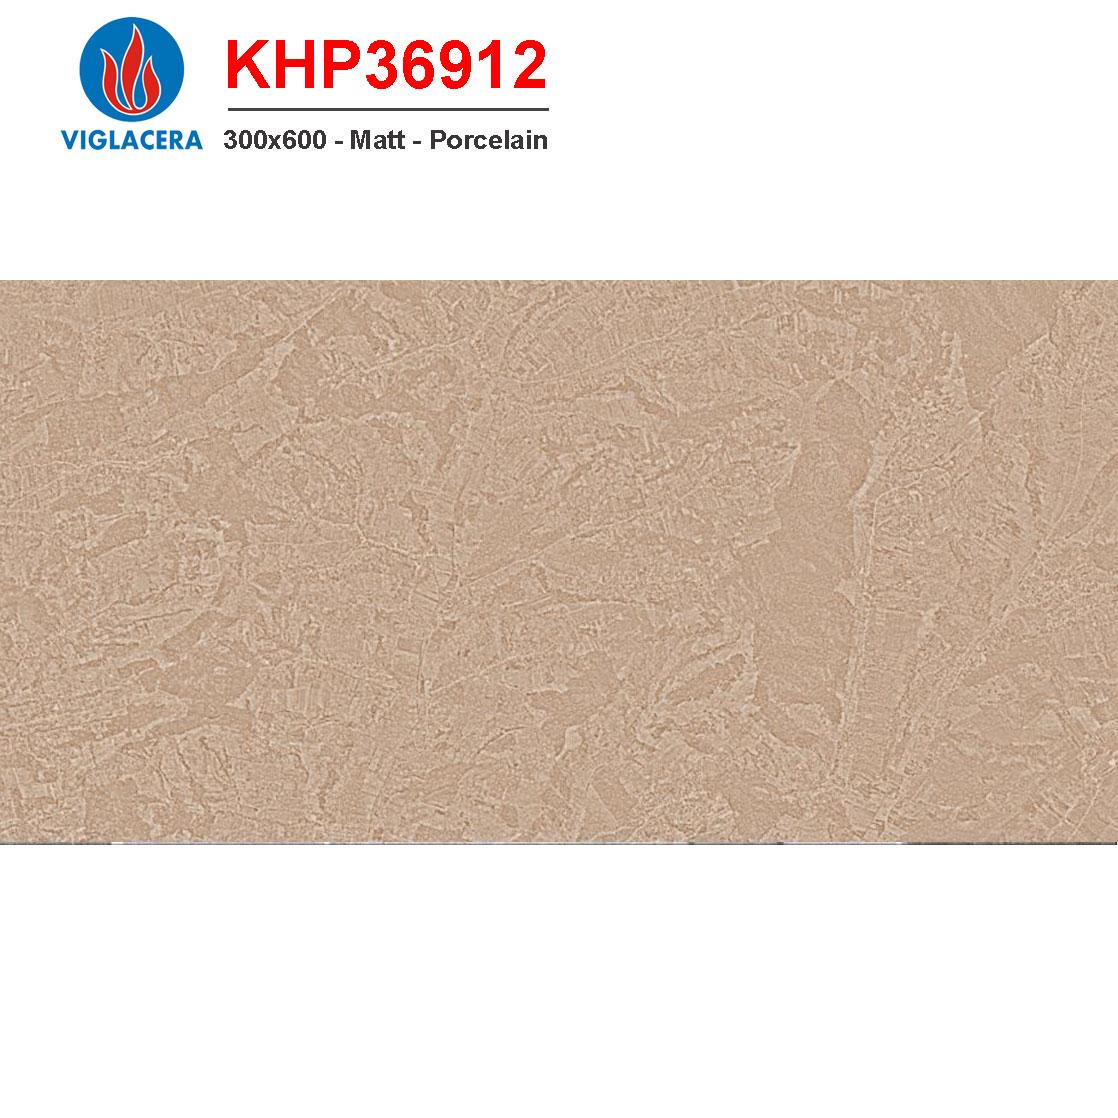 Gạch ốp tường men Matt Viglacera KHP36912 giá rẻ